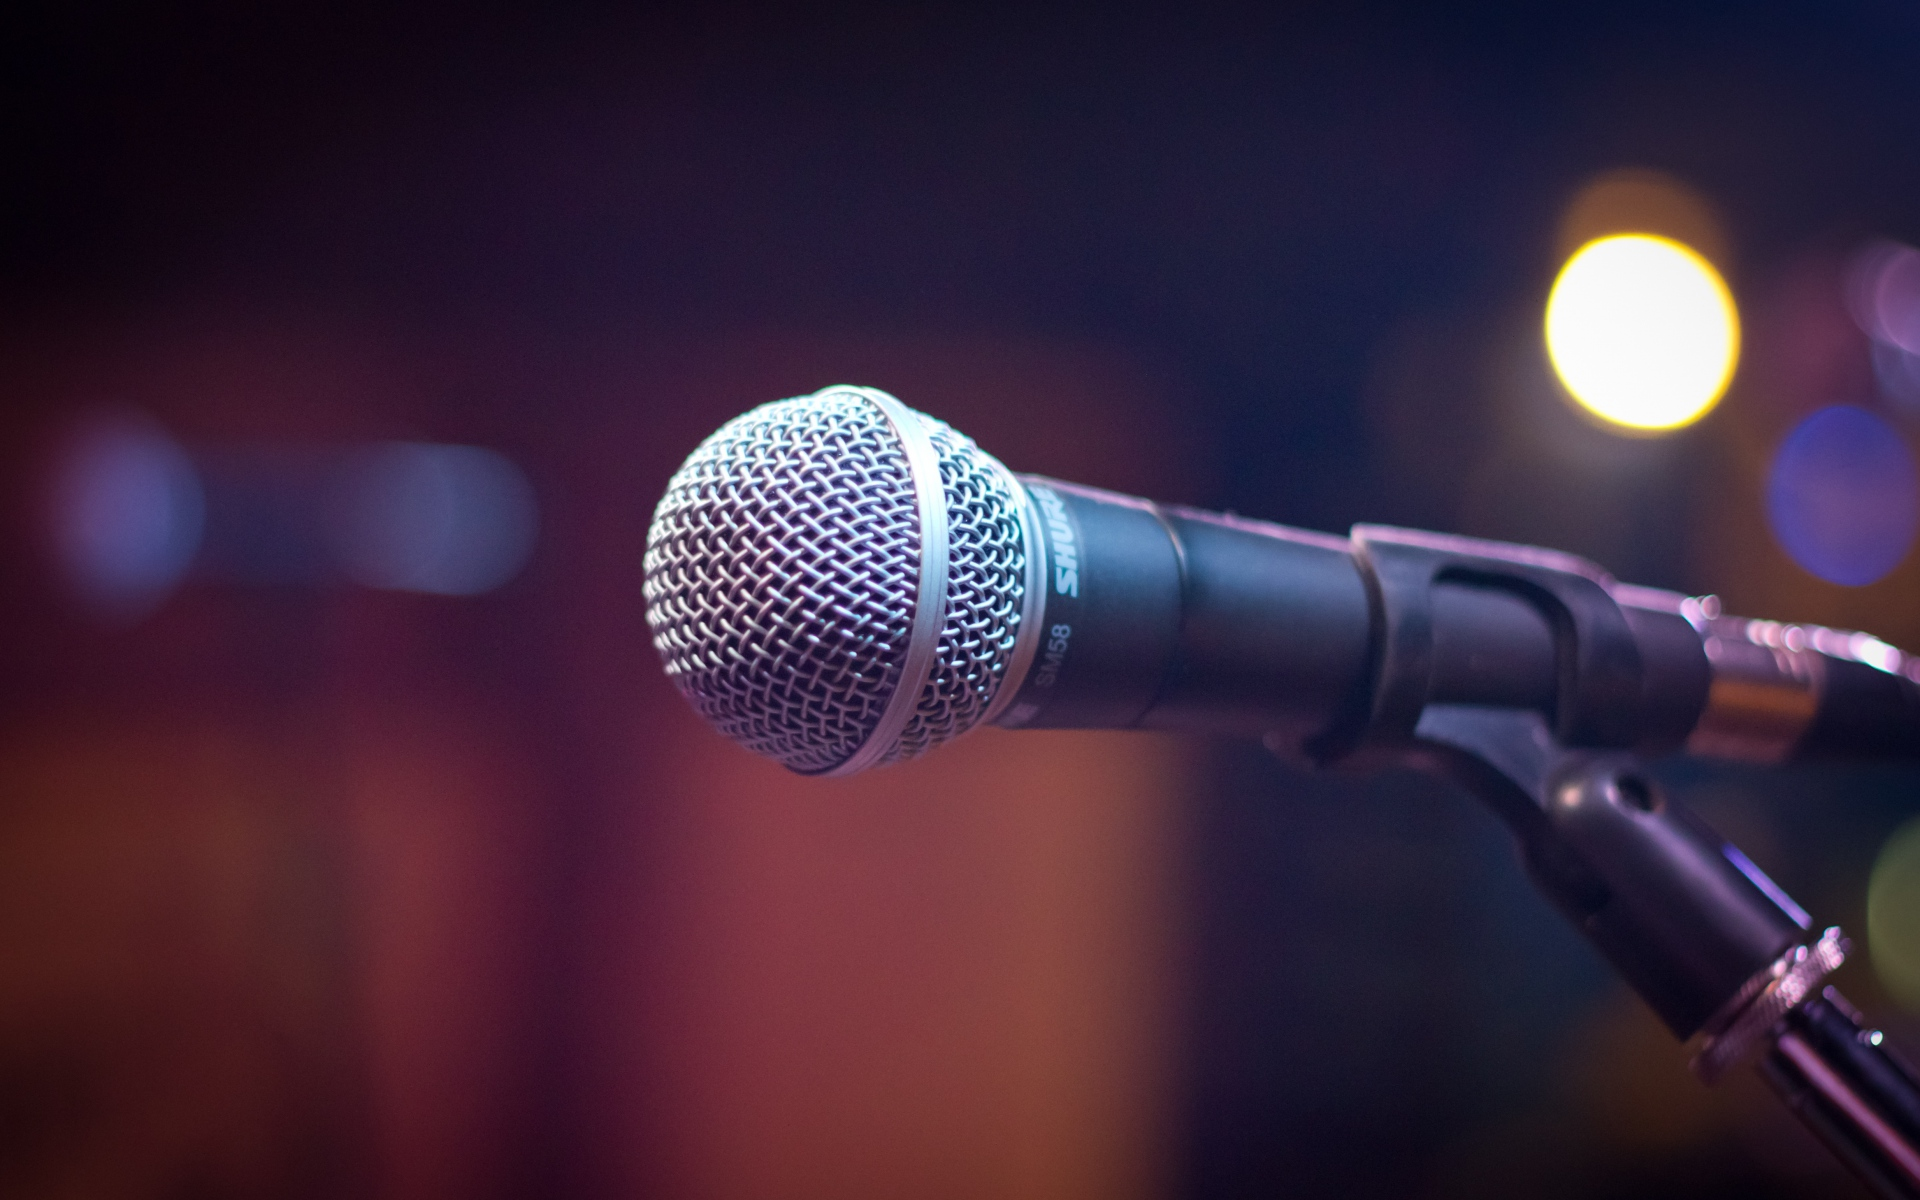 Картинки Микрофон, звук, музыка фото и обои на рабочий стол